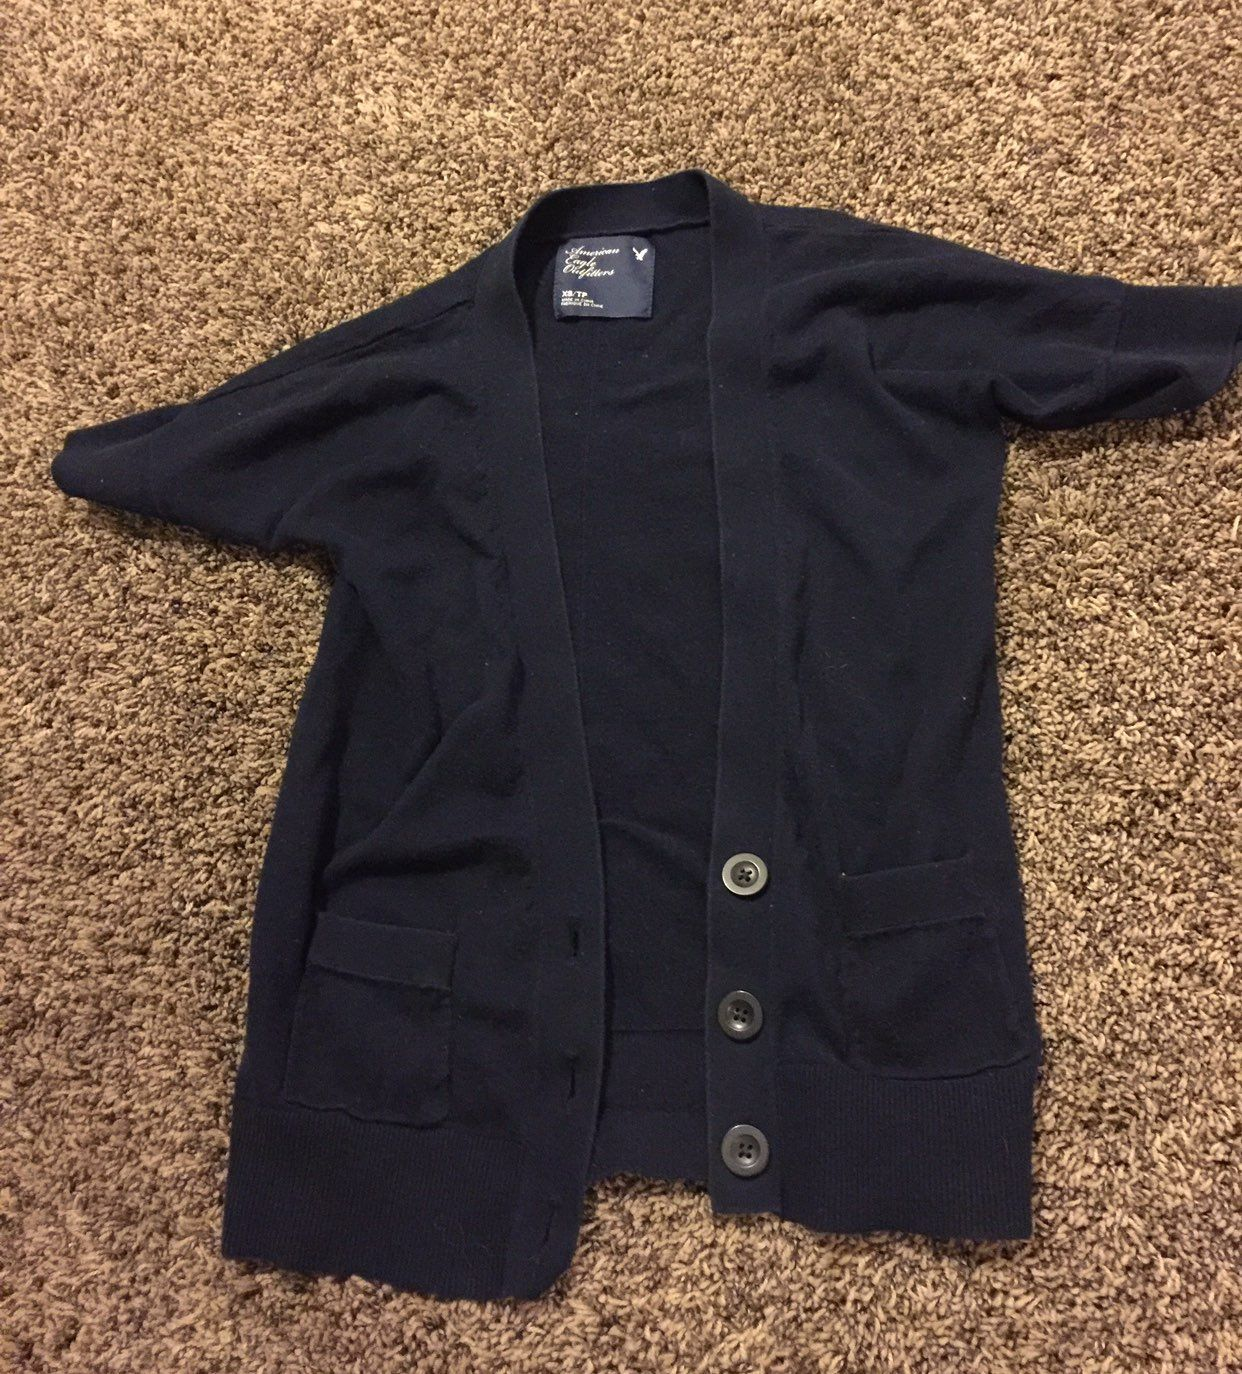 AE Short Sleeve Cardigan XS - Mercari: BUY & SELL THINGS YOU LOVE